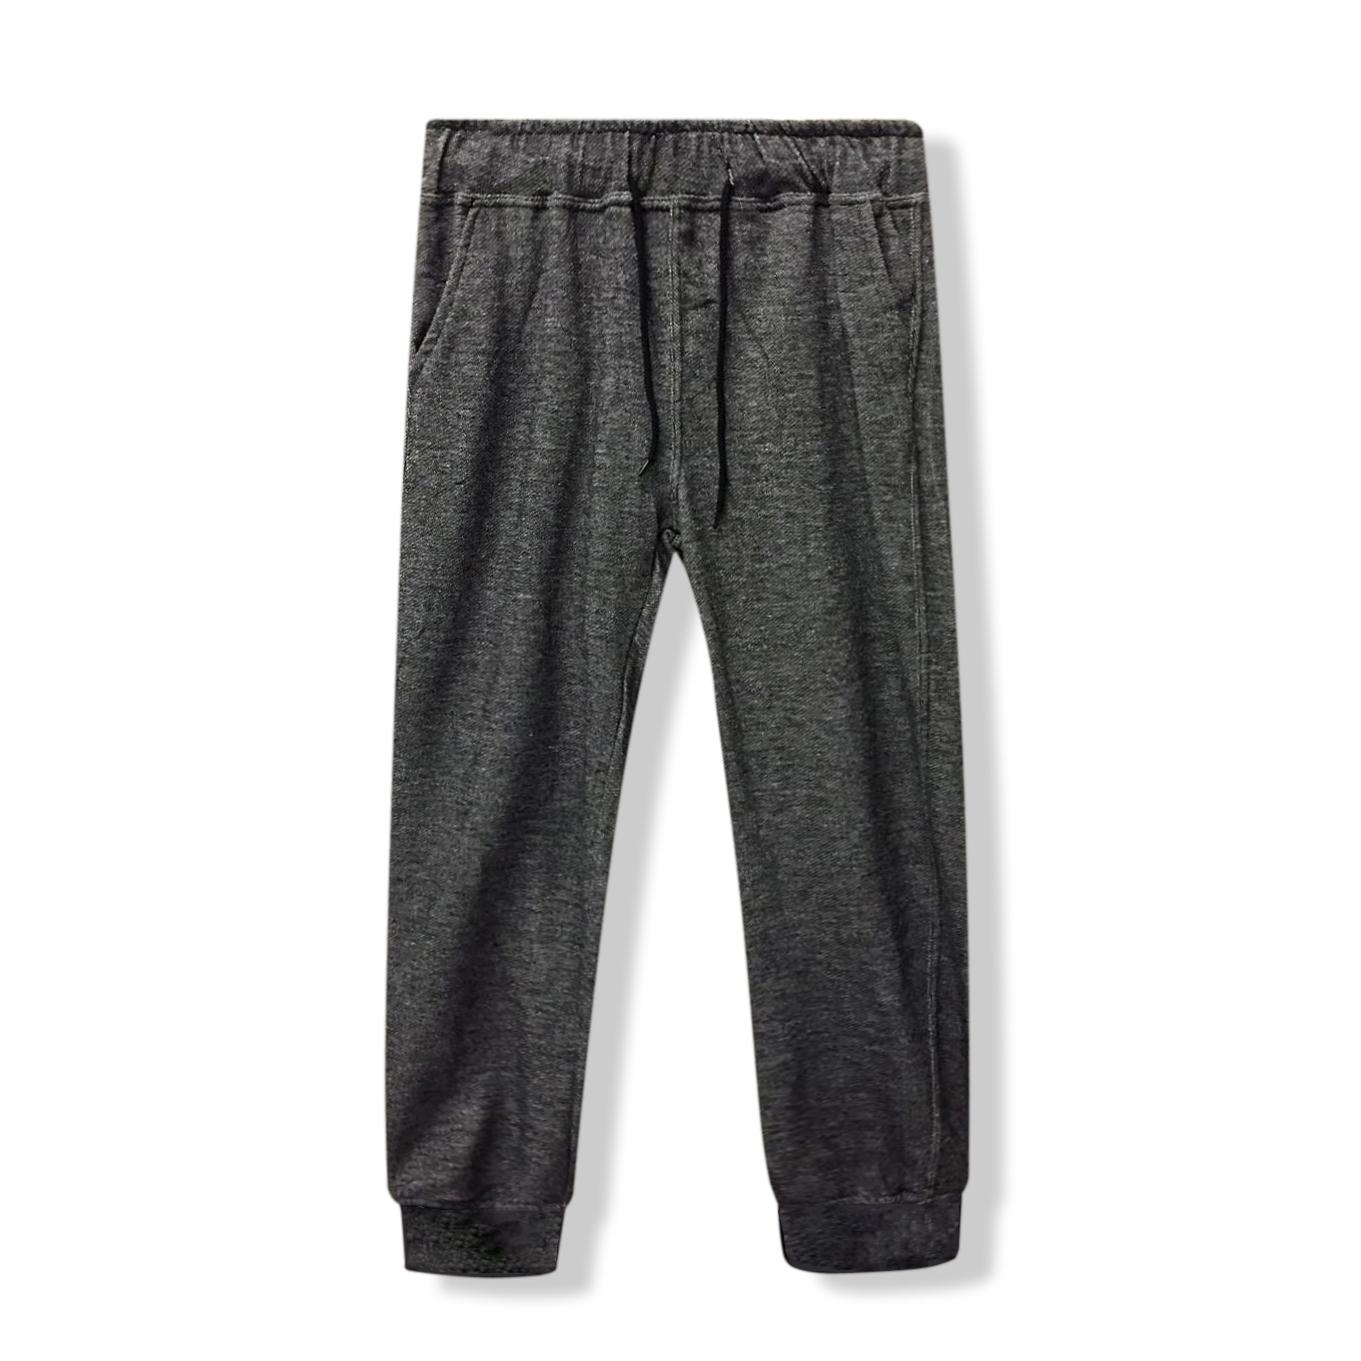 Men's Casual Jogger Sportwear pants Gym Run Drawstring ...